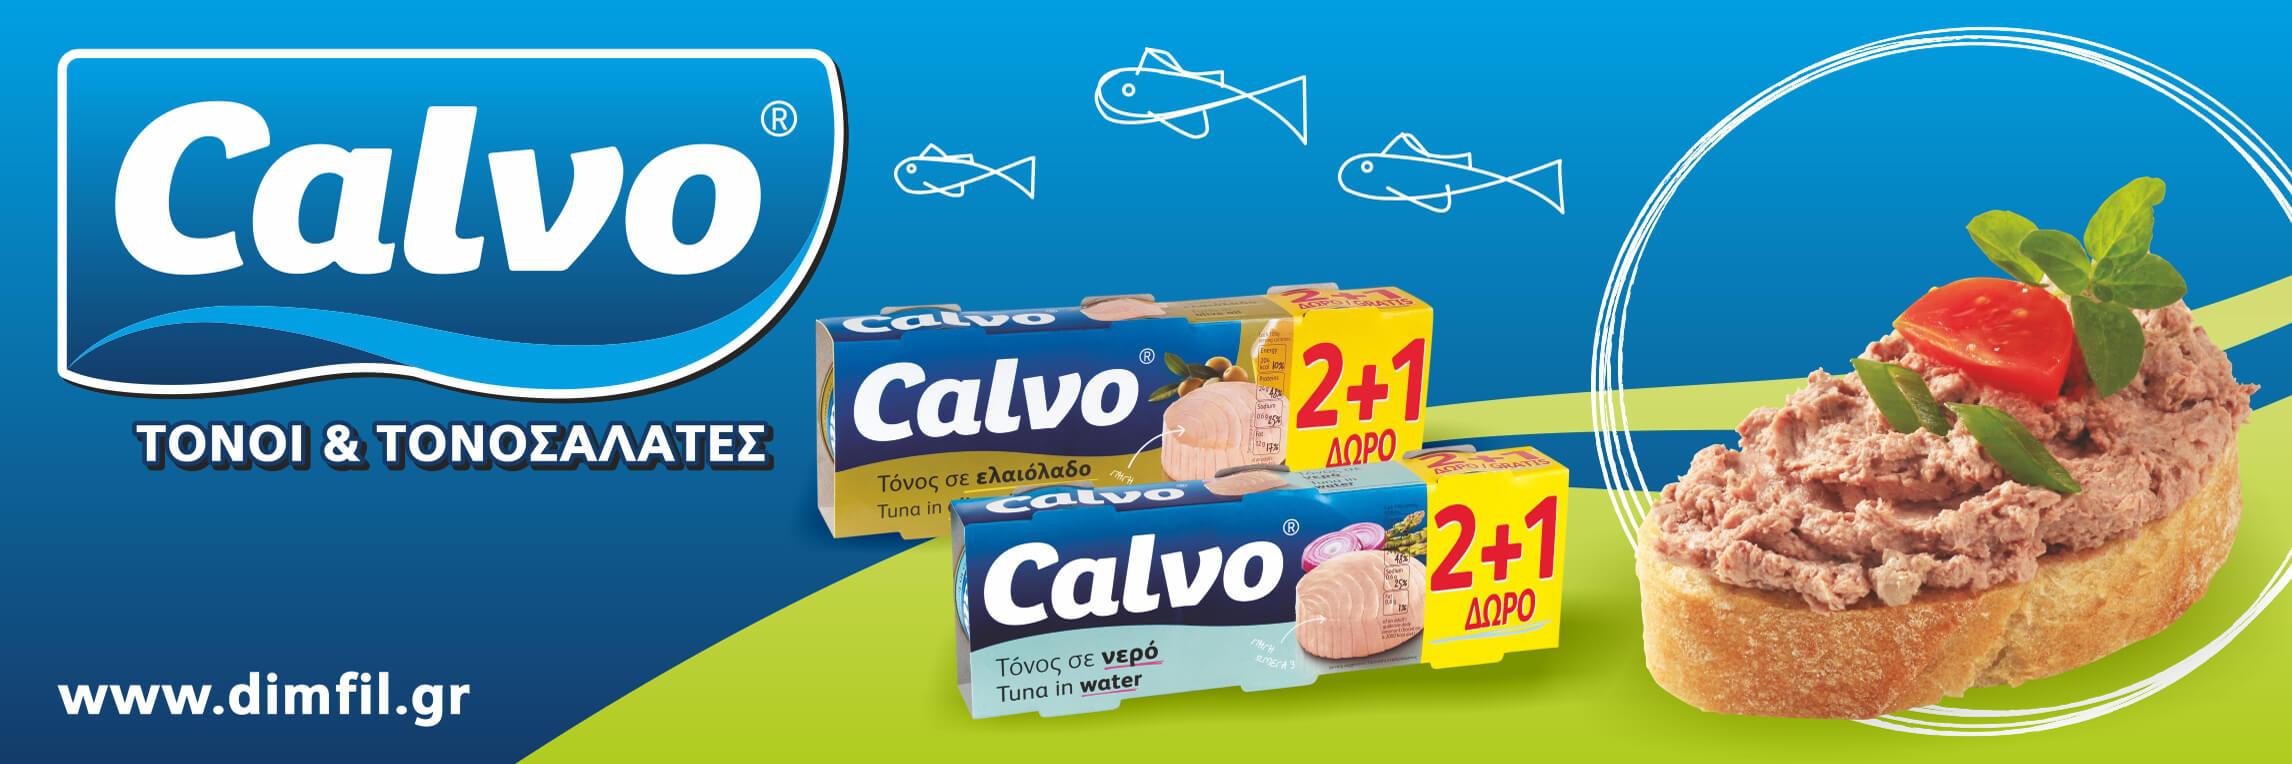 slider 2292x764px calvo-c